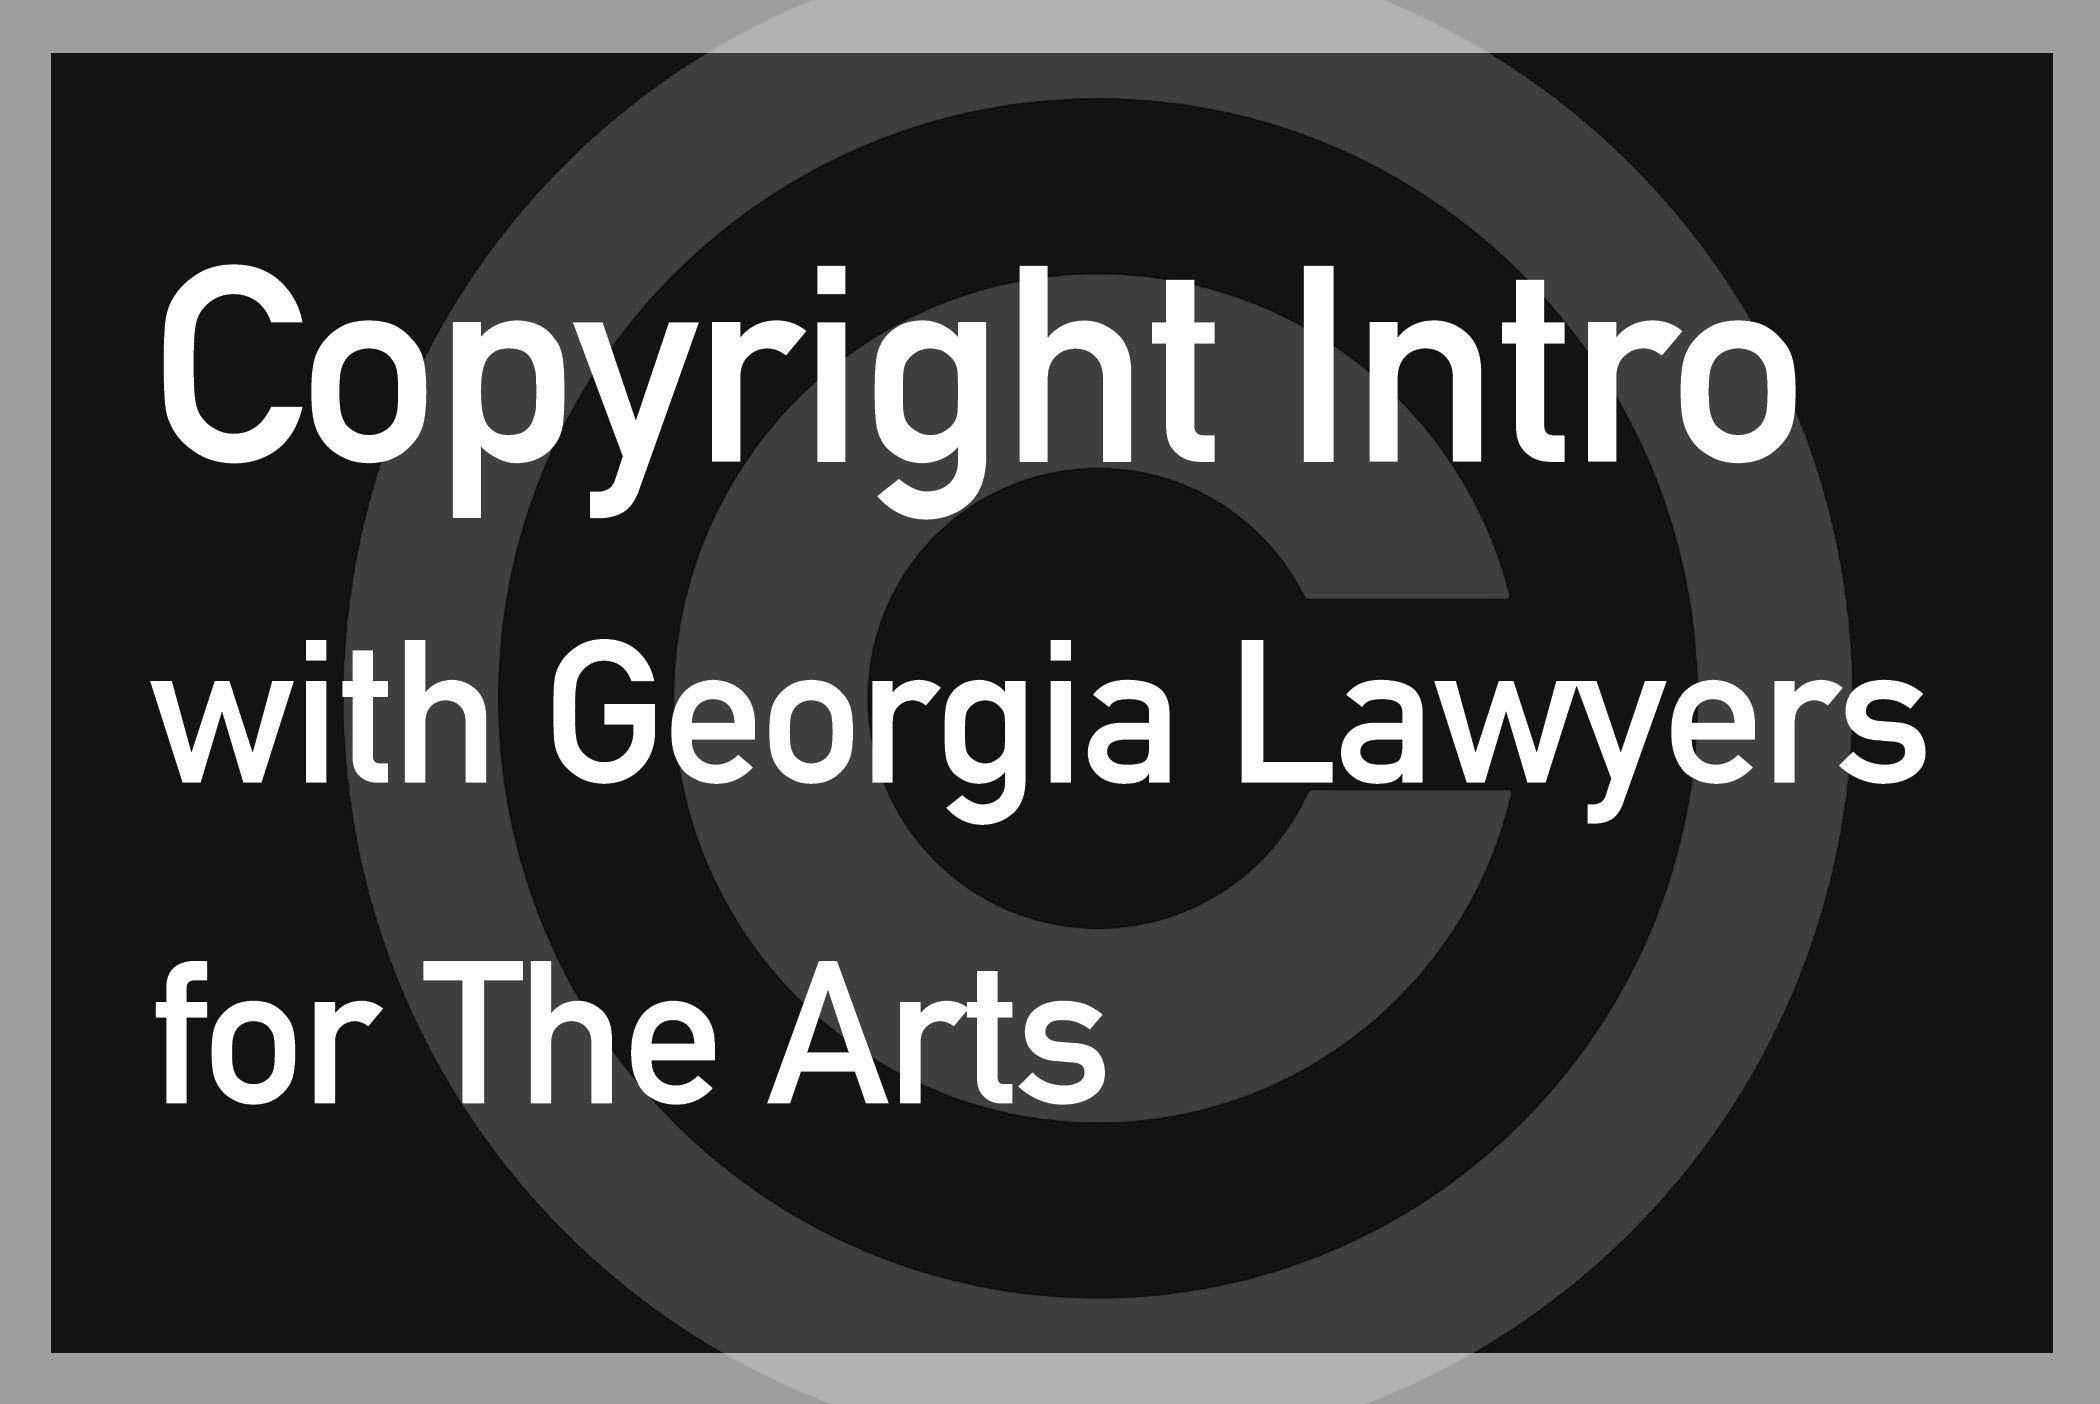 Copyright-Intro-5.jpg